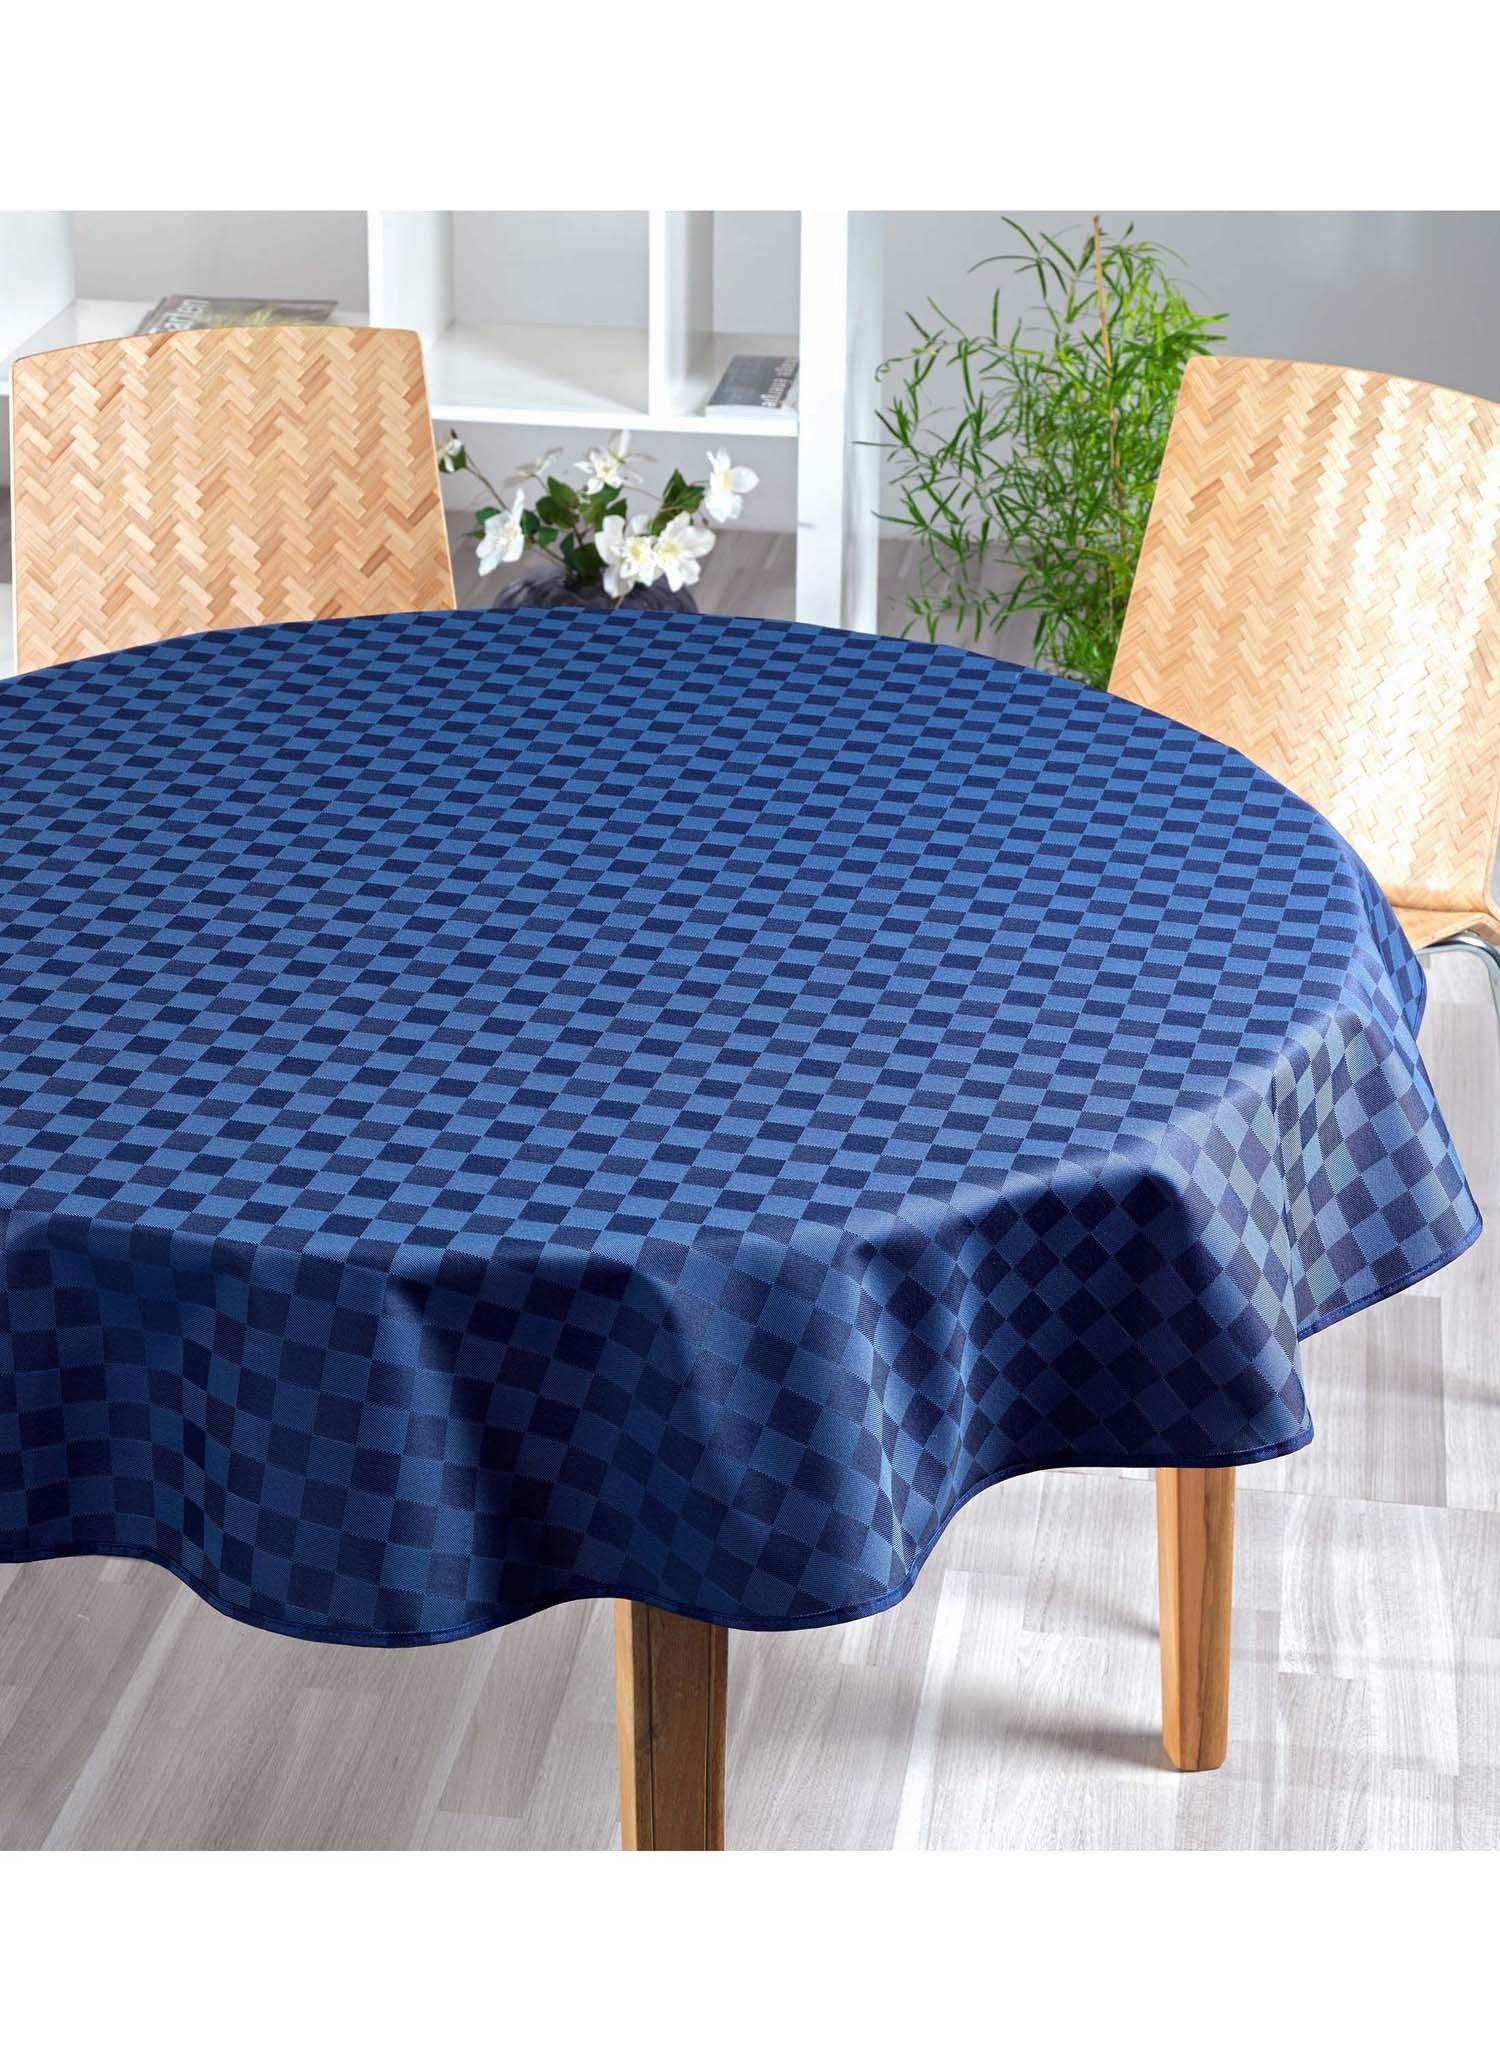 S-Tischd.J-Würfel blau 140x180 - 1 - Ronja.ch